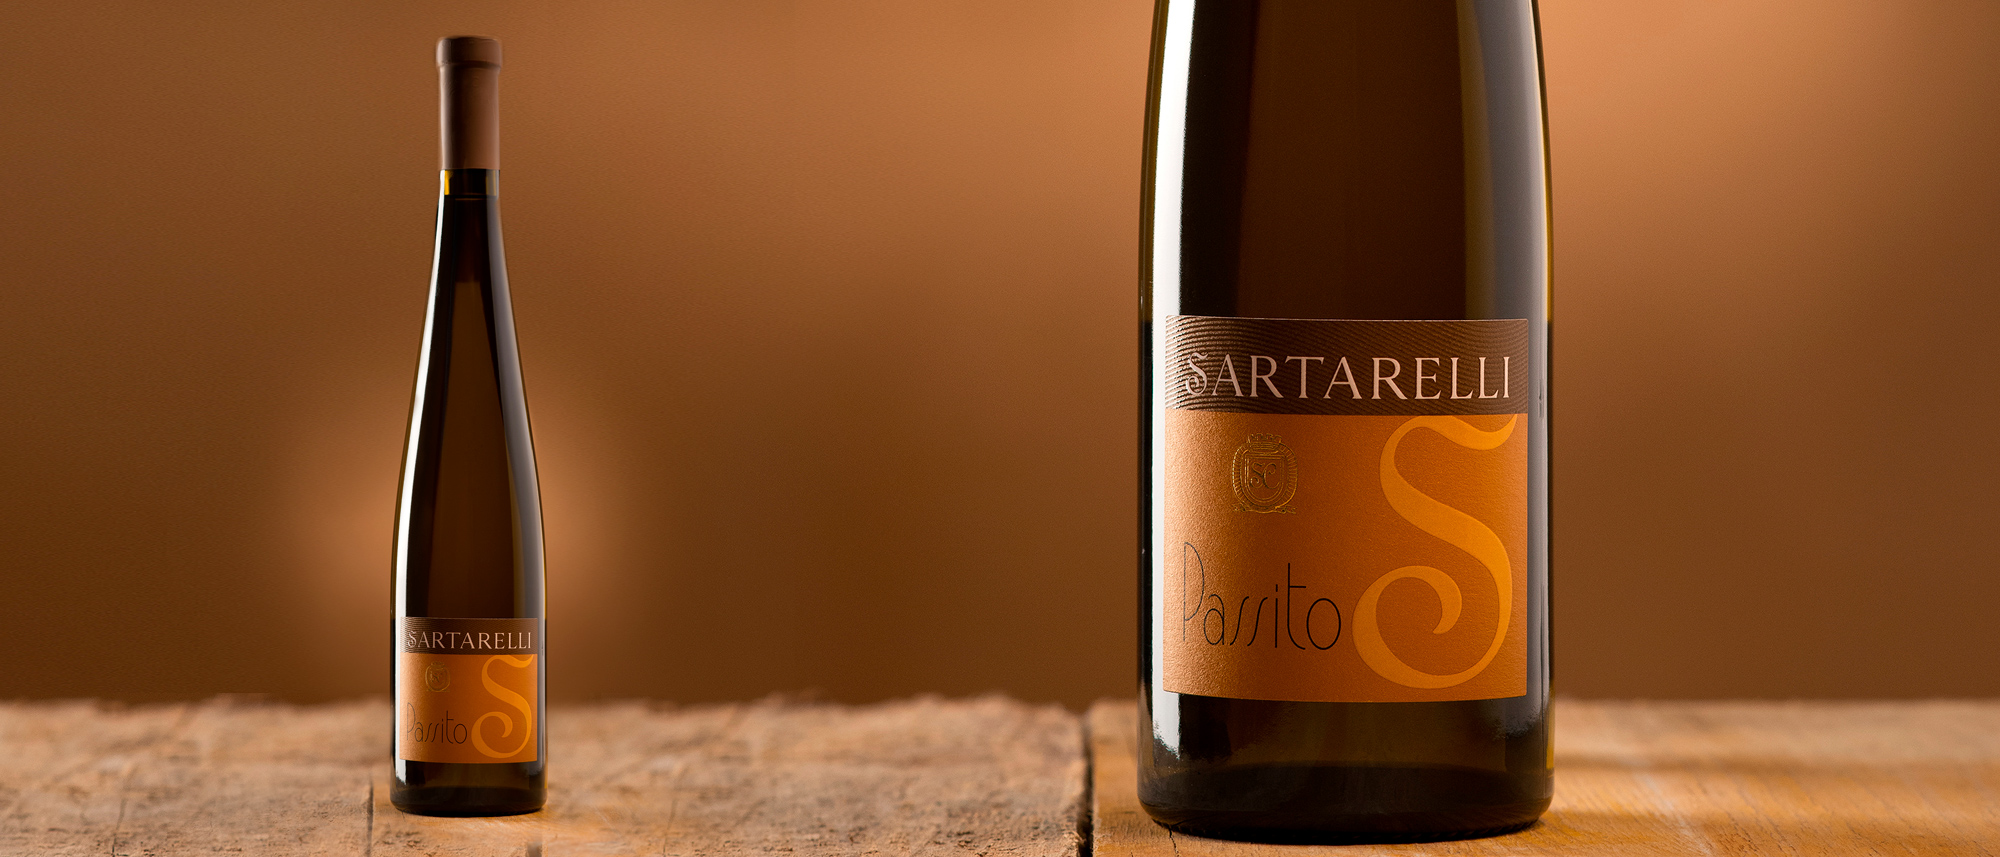 Bottiglia Sartarelli Passito